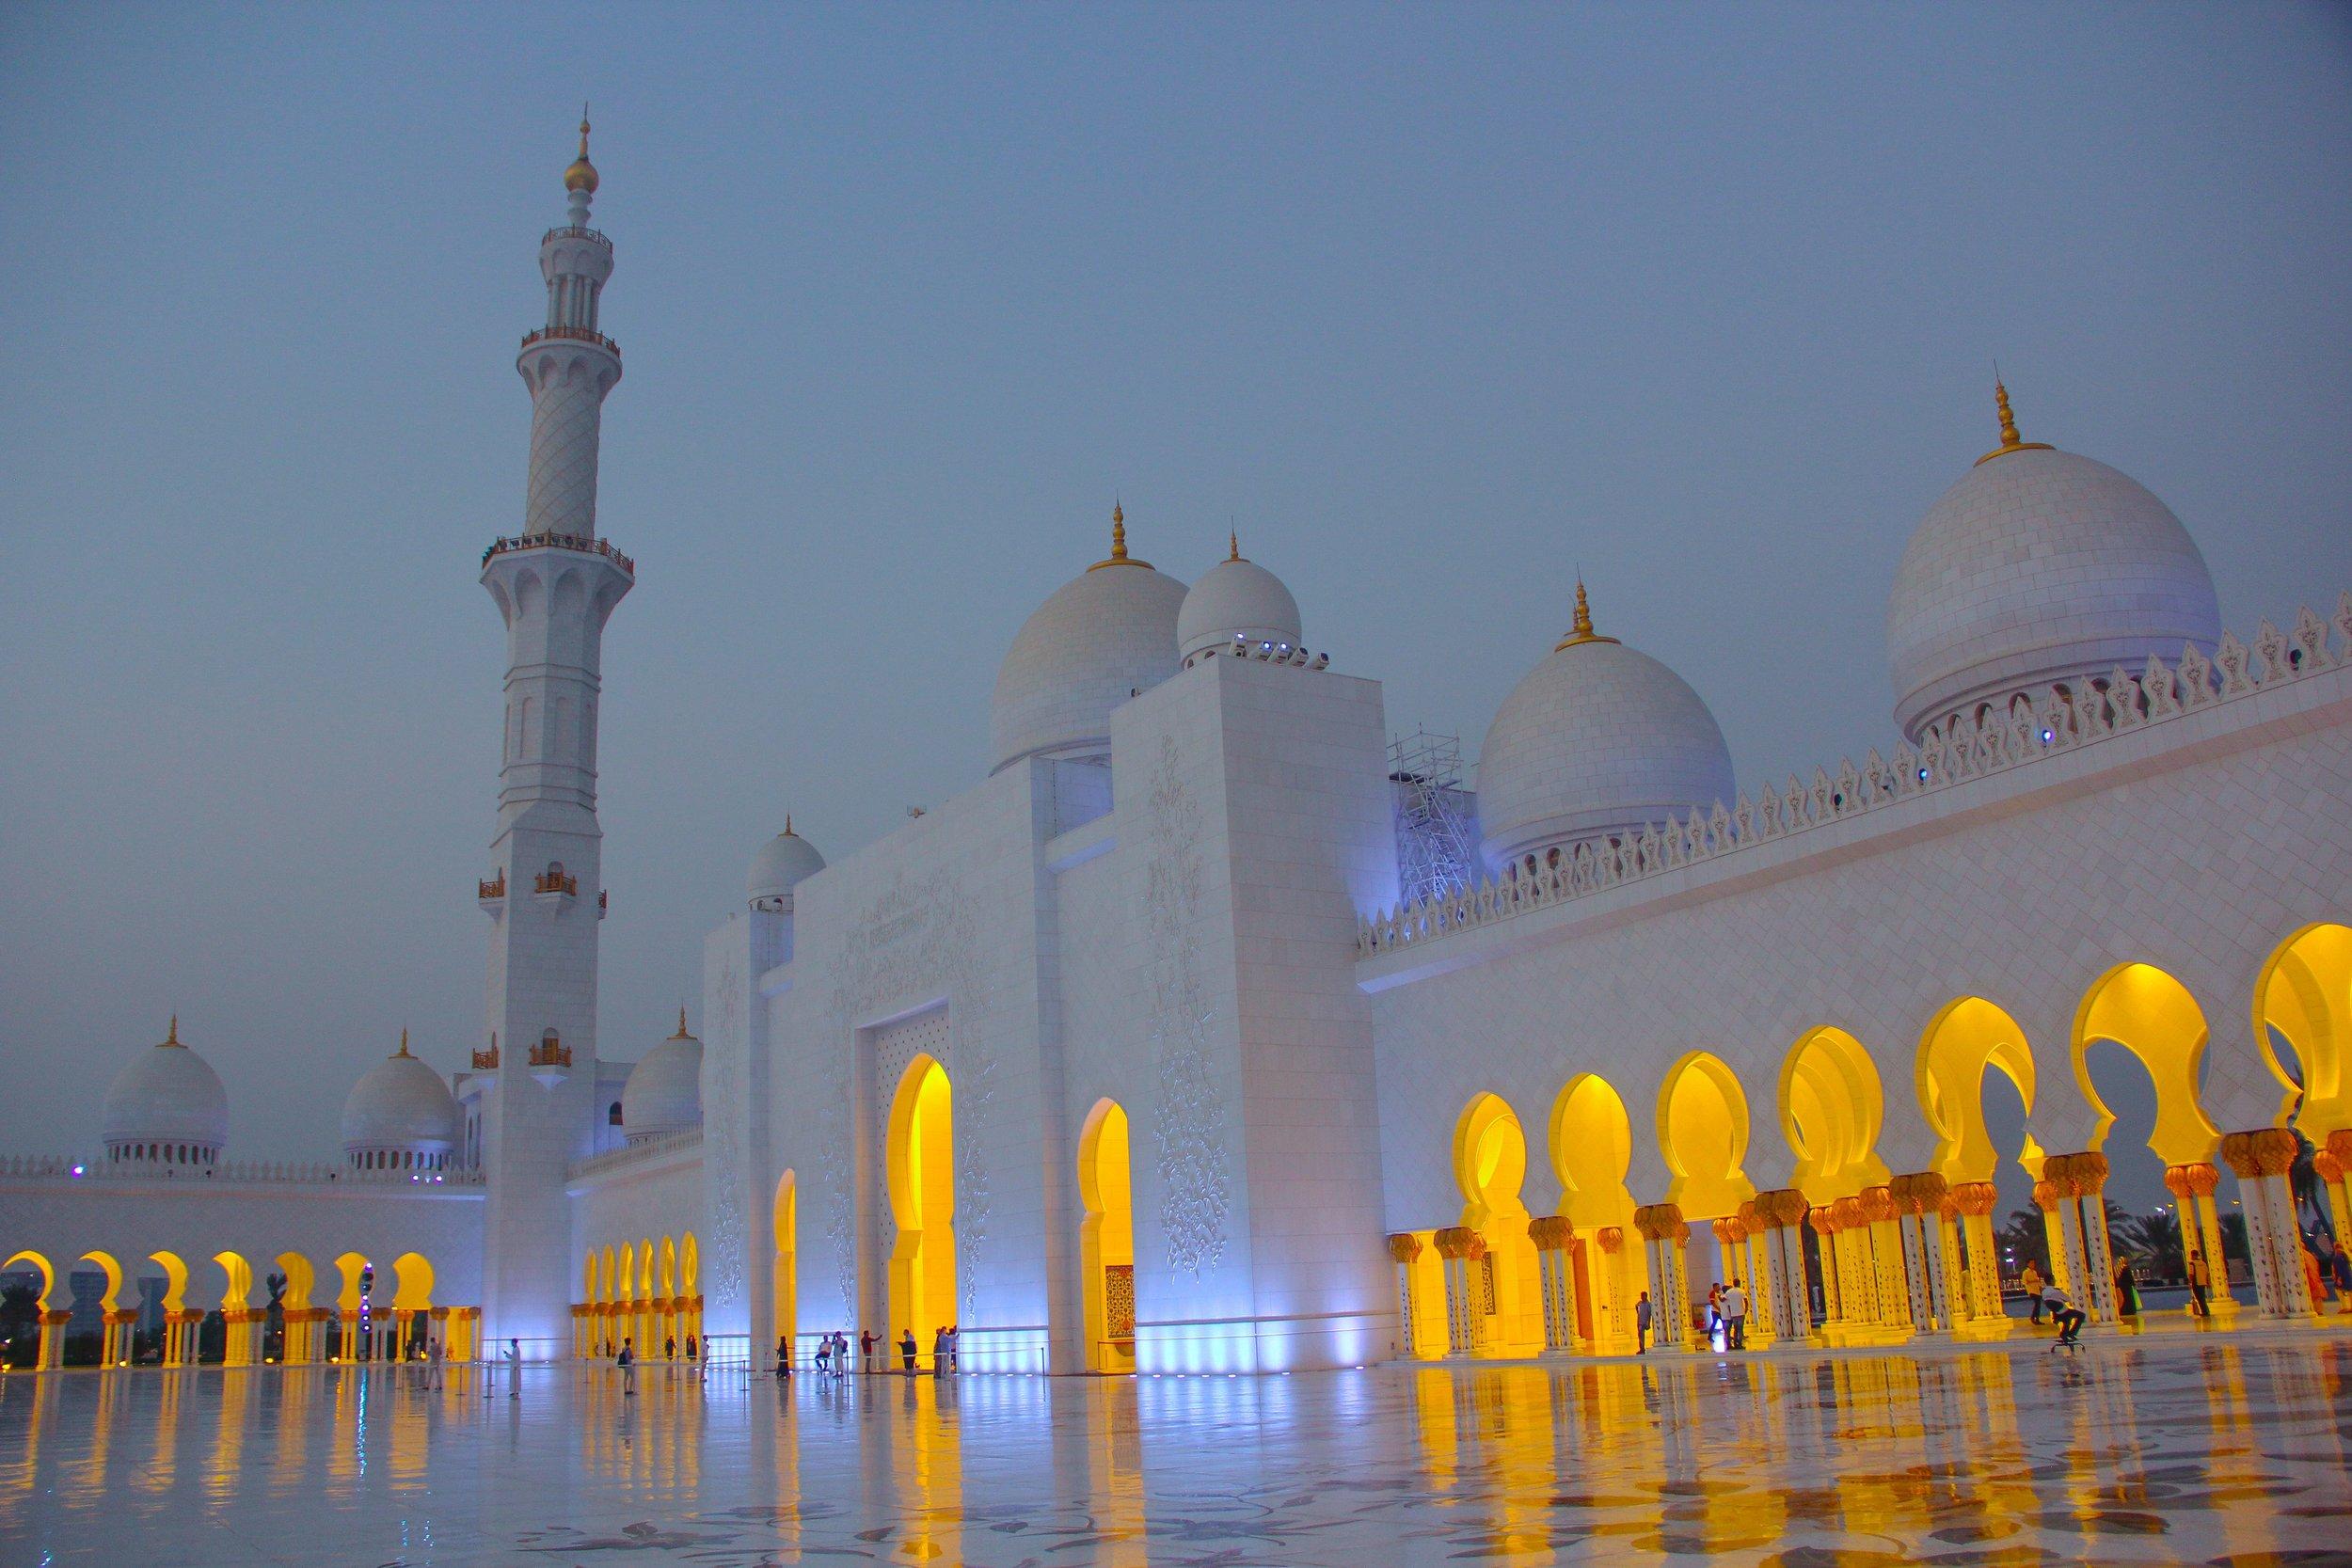 abu-dhabi-arches-architecture-1537086.jpg